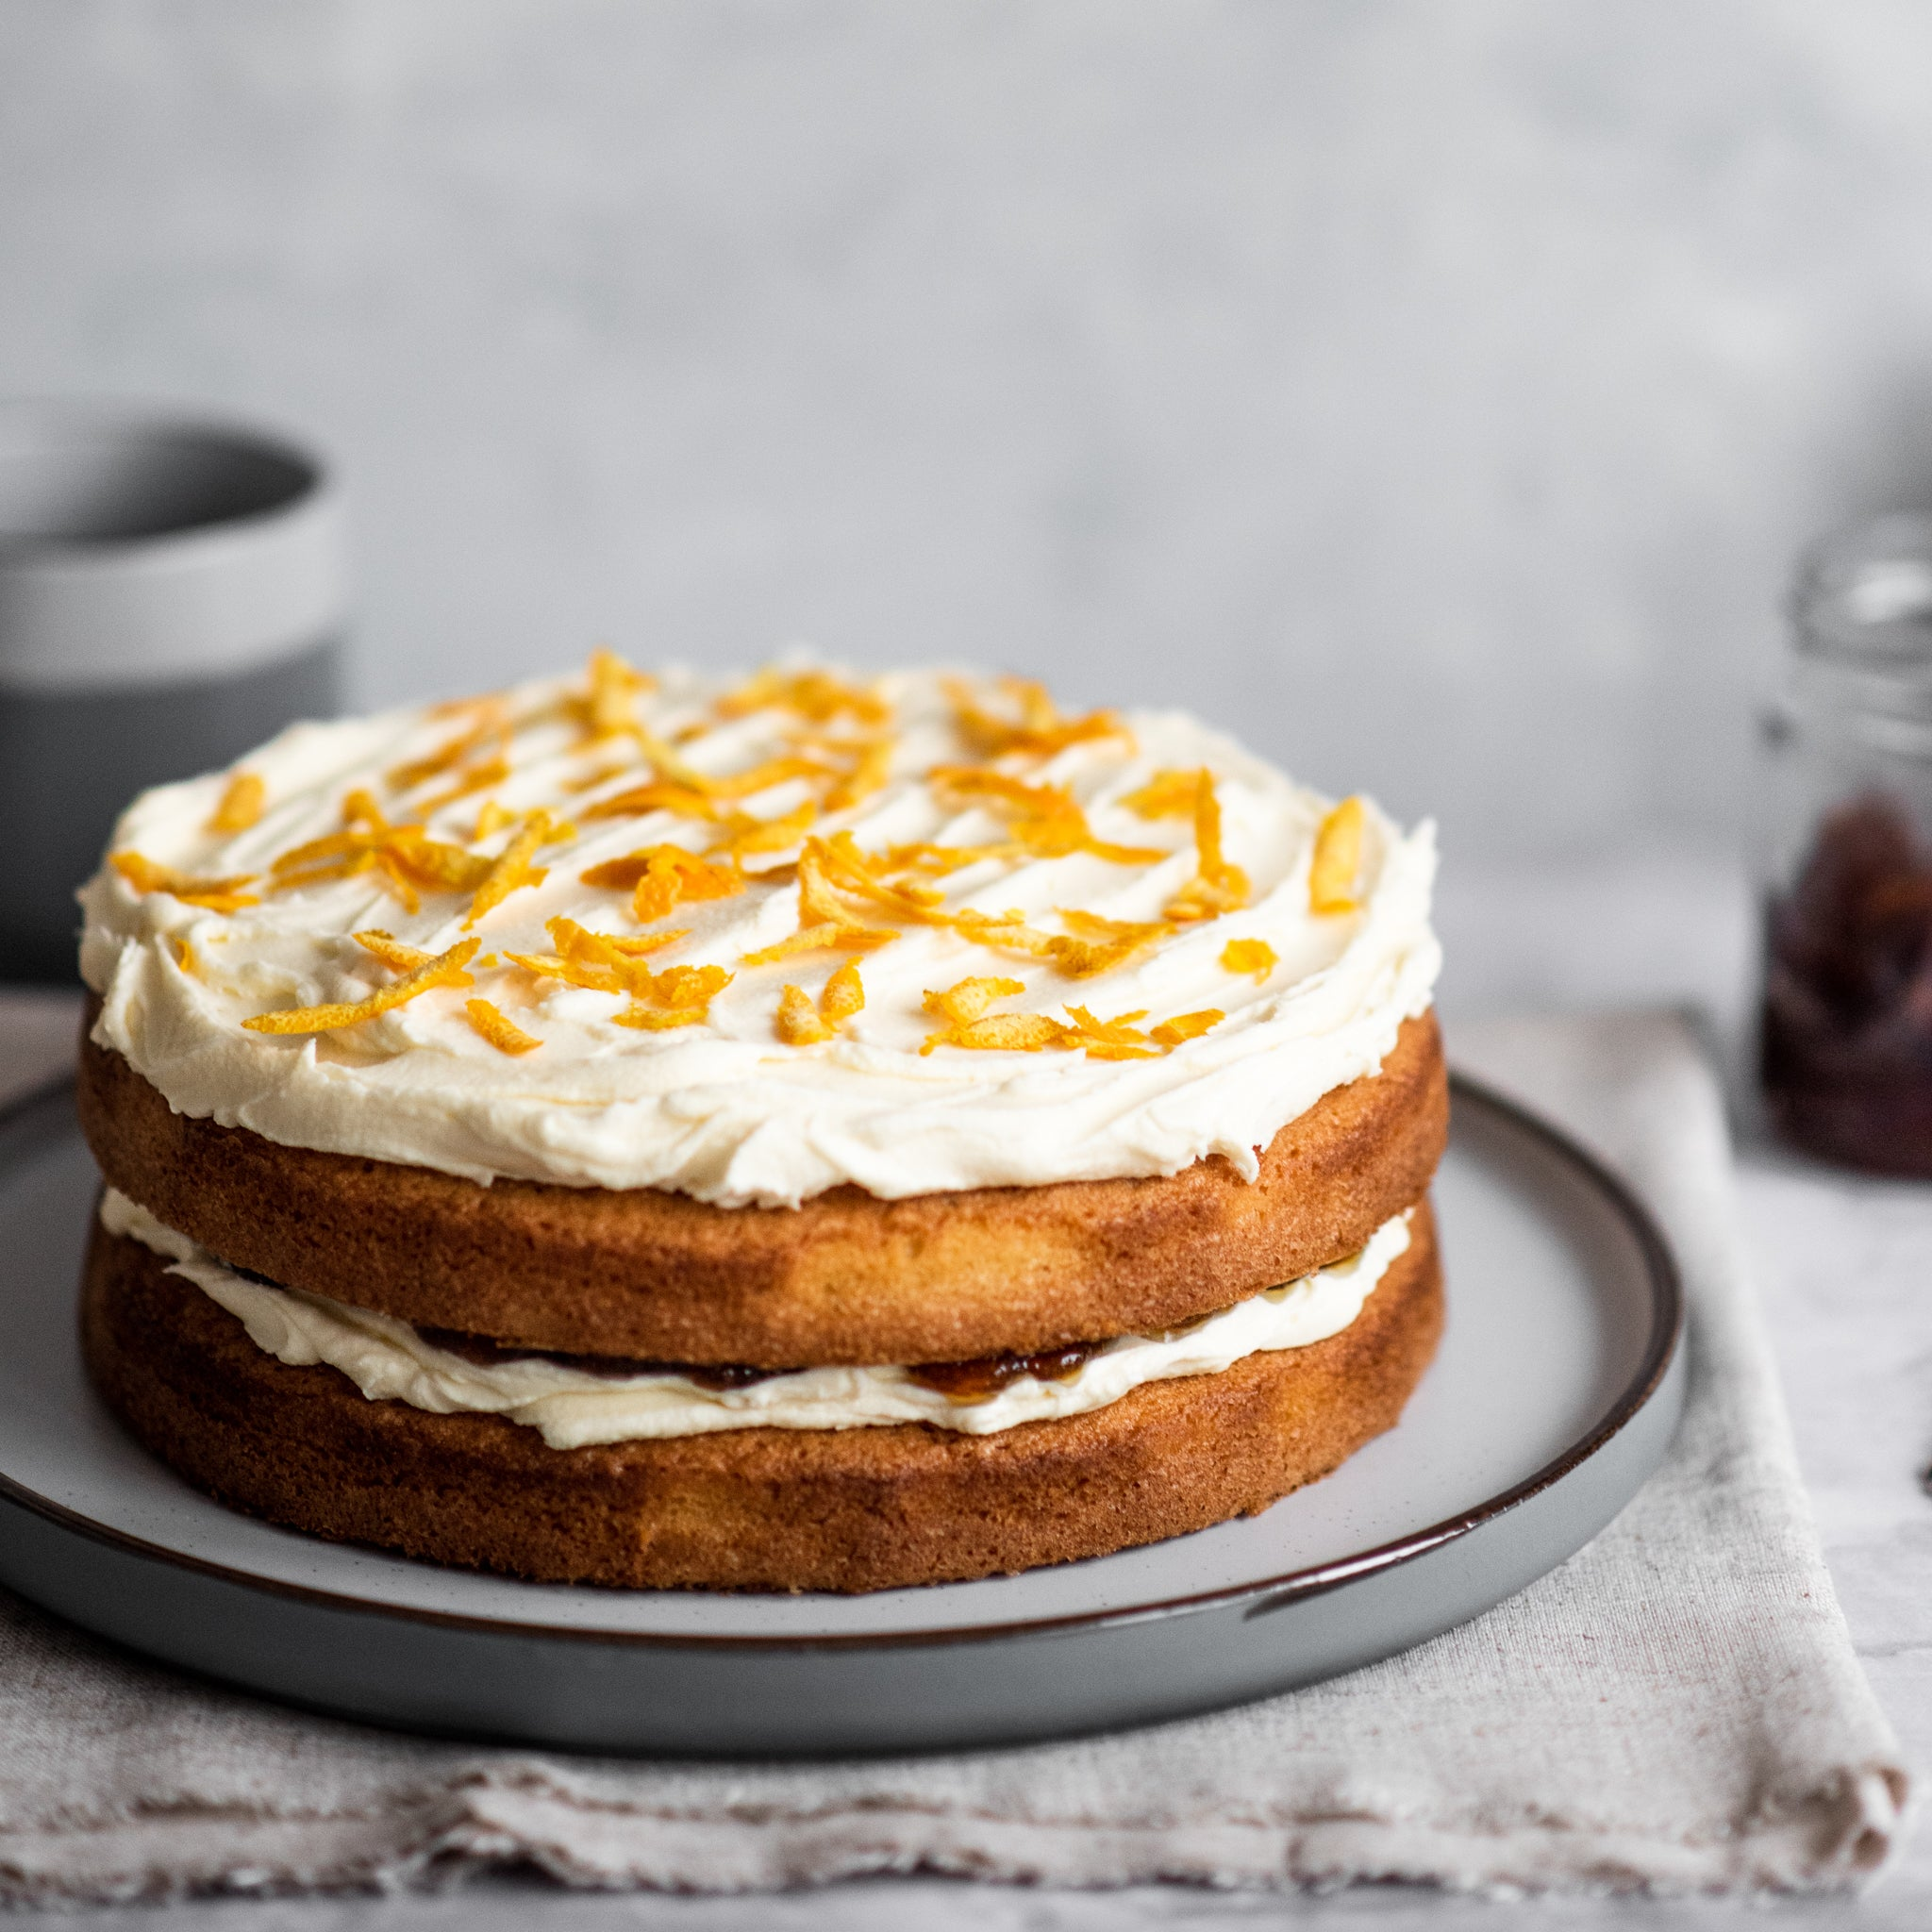 Layered Marmalade Cake